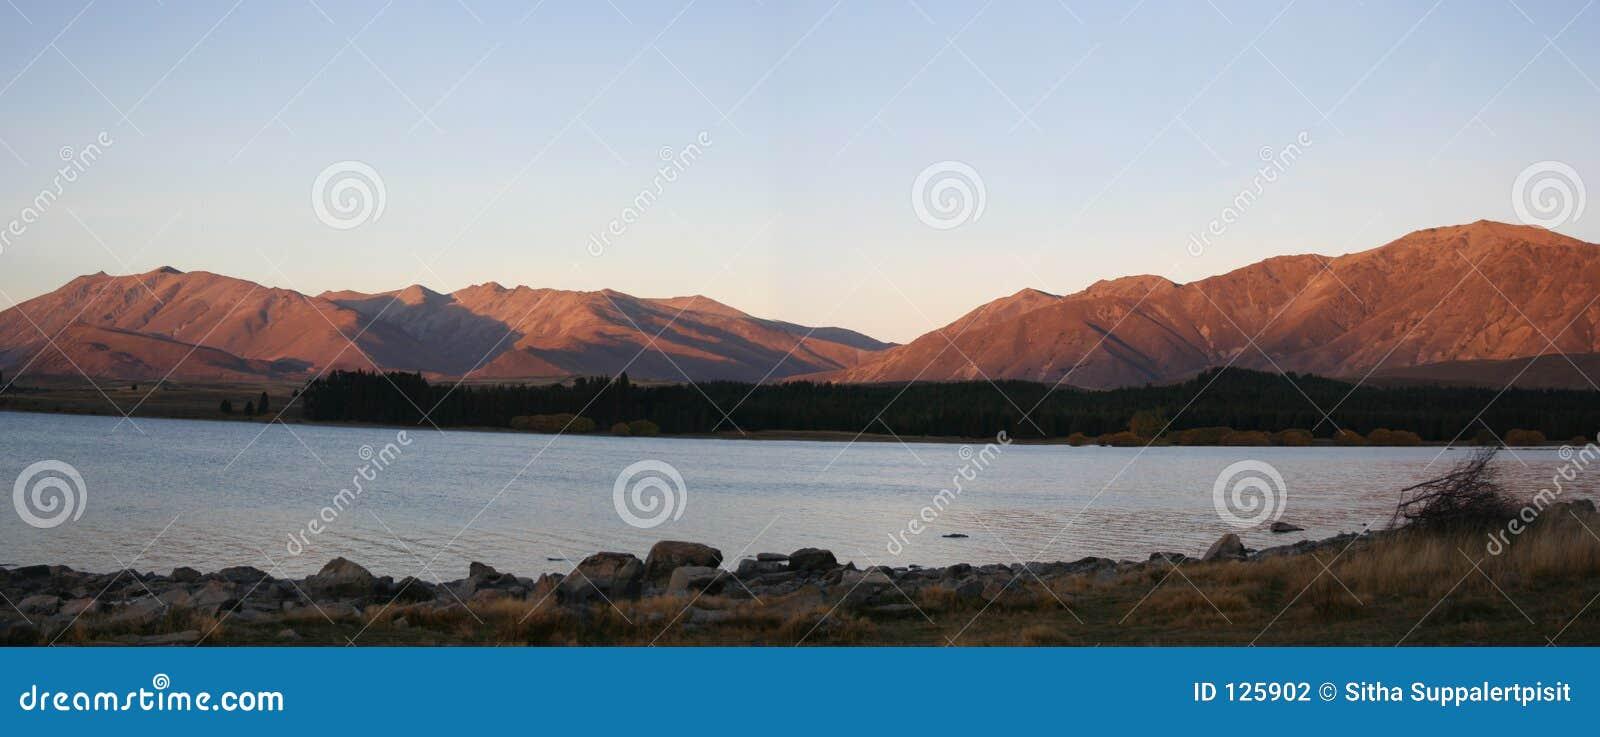 Tekapo zealand панорамы озера новое